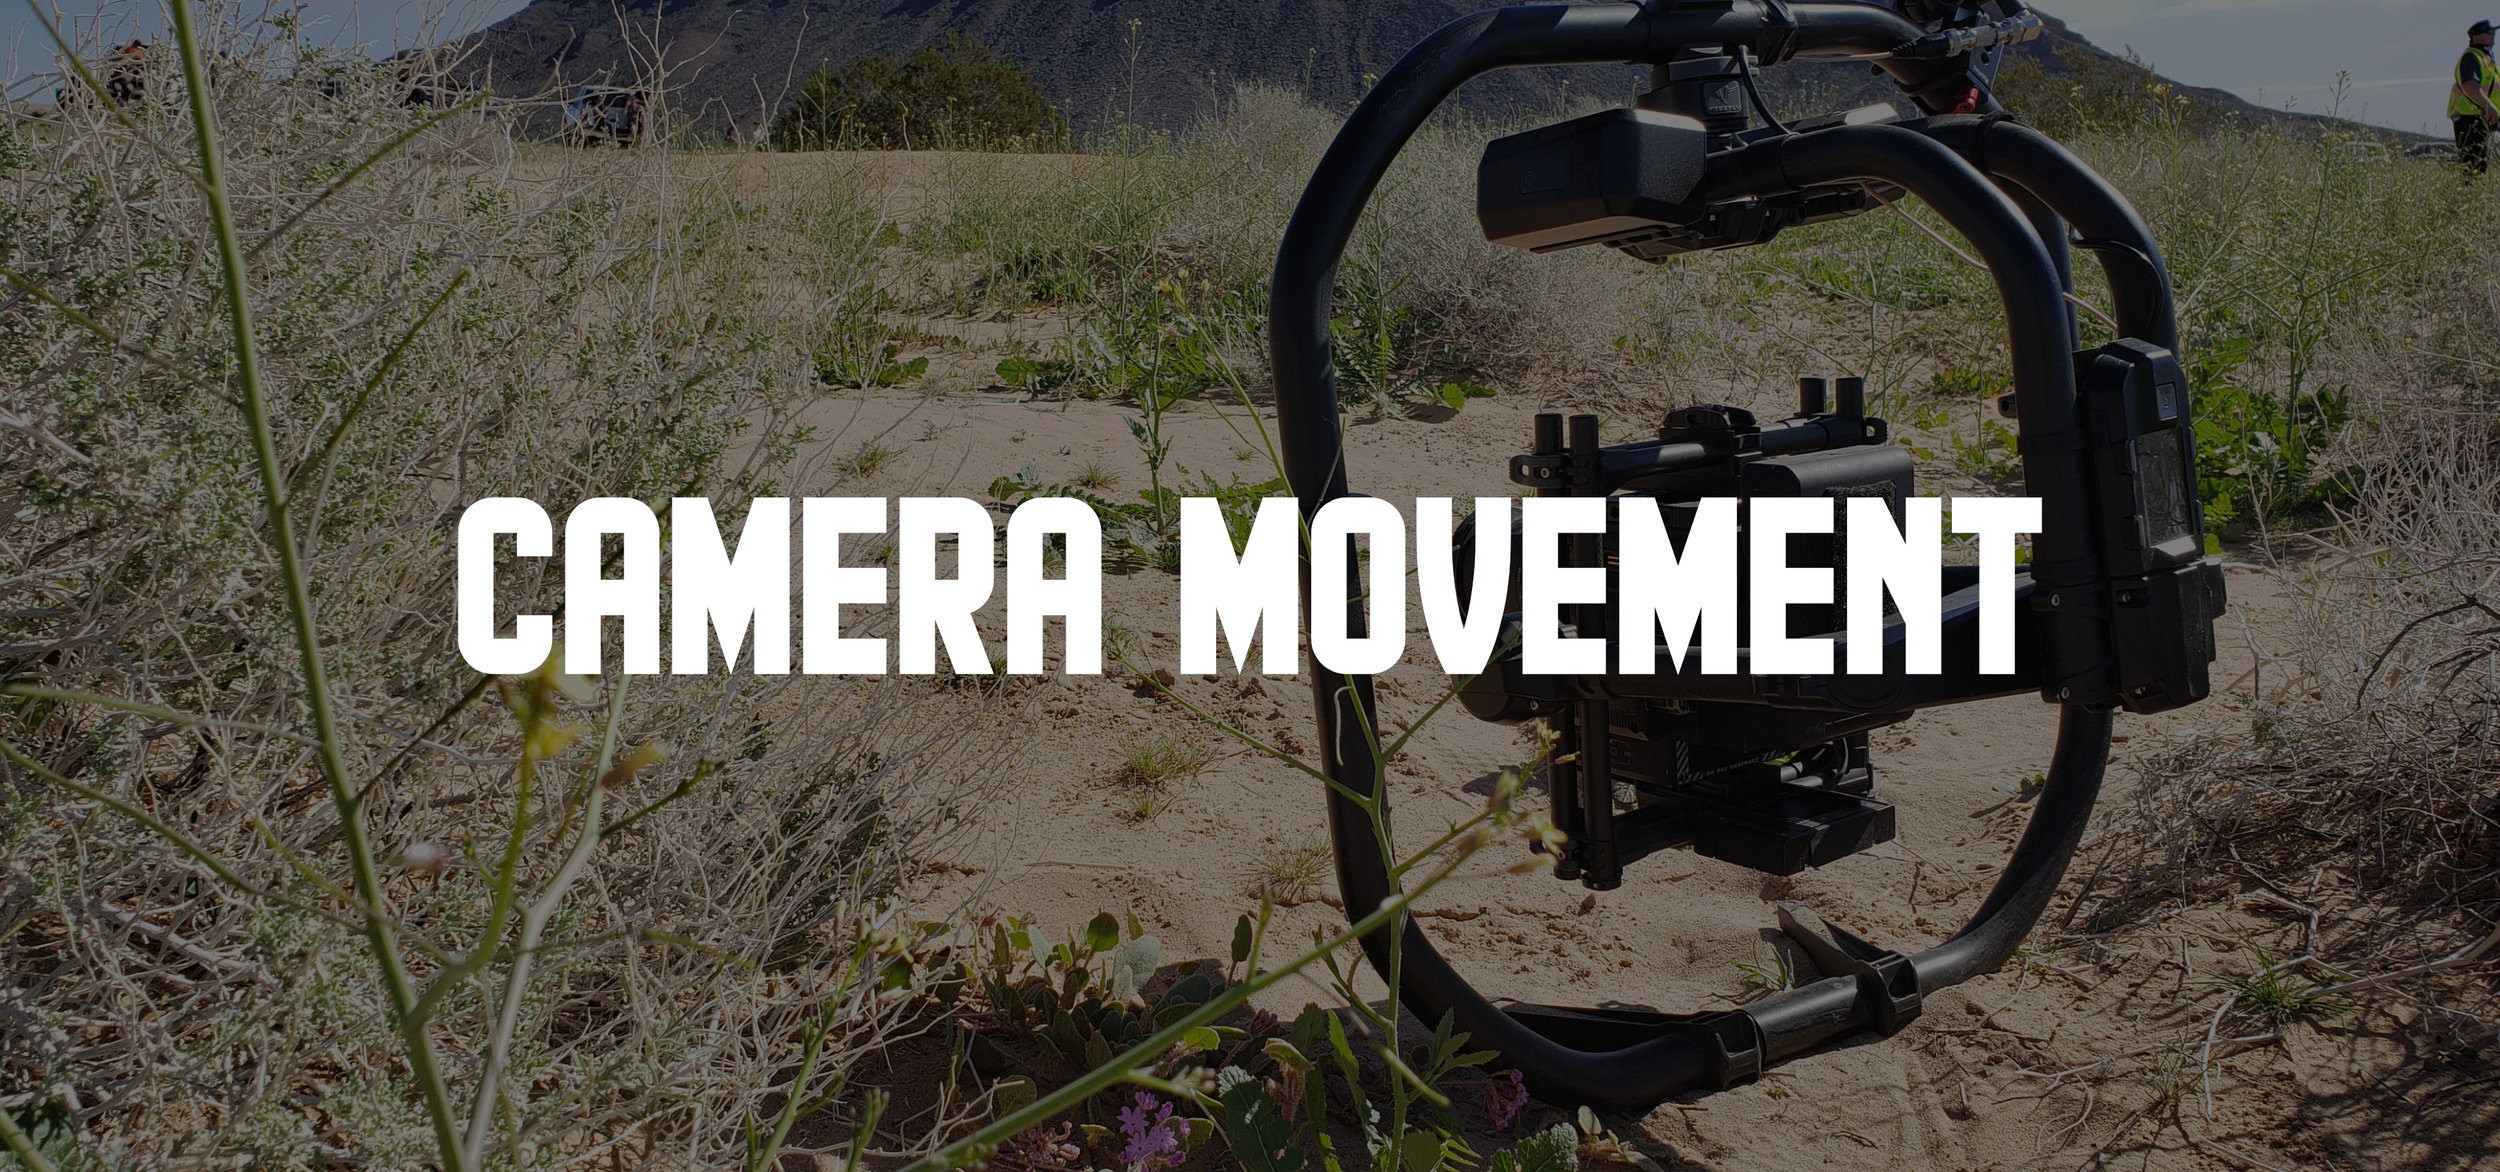 camera movement service.jpg